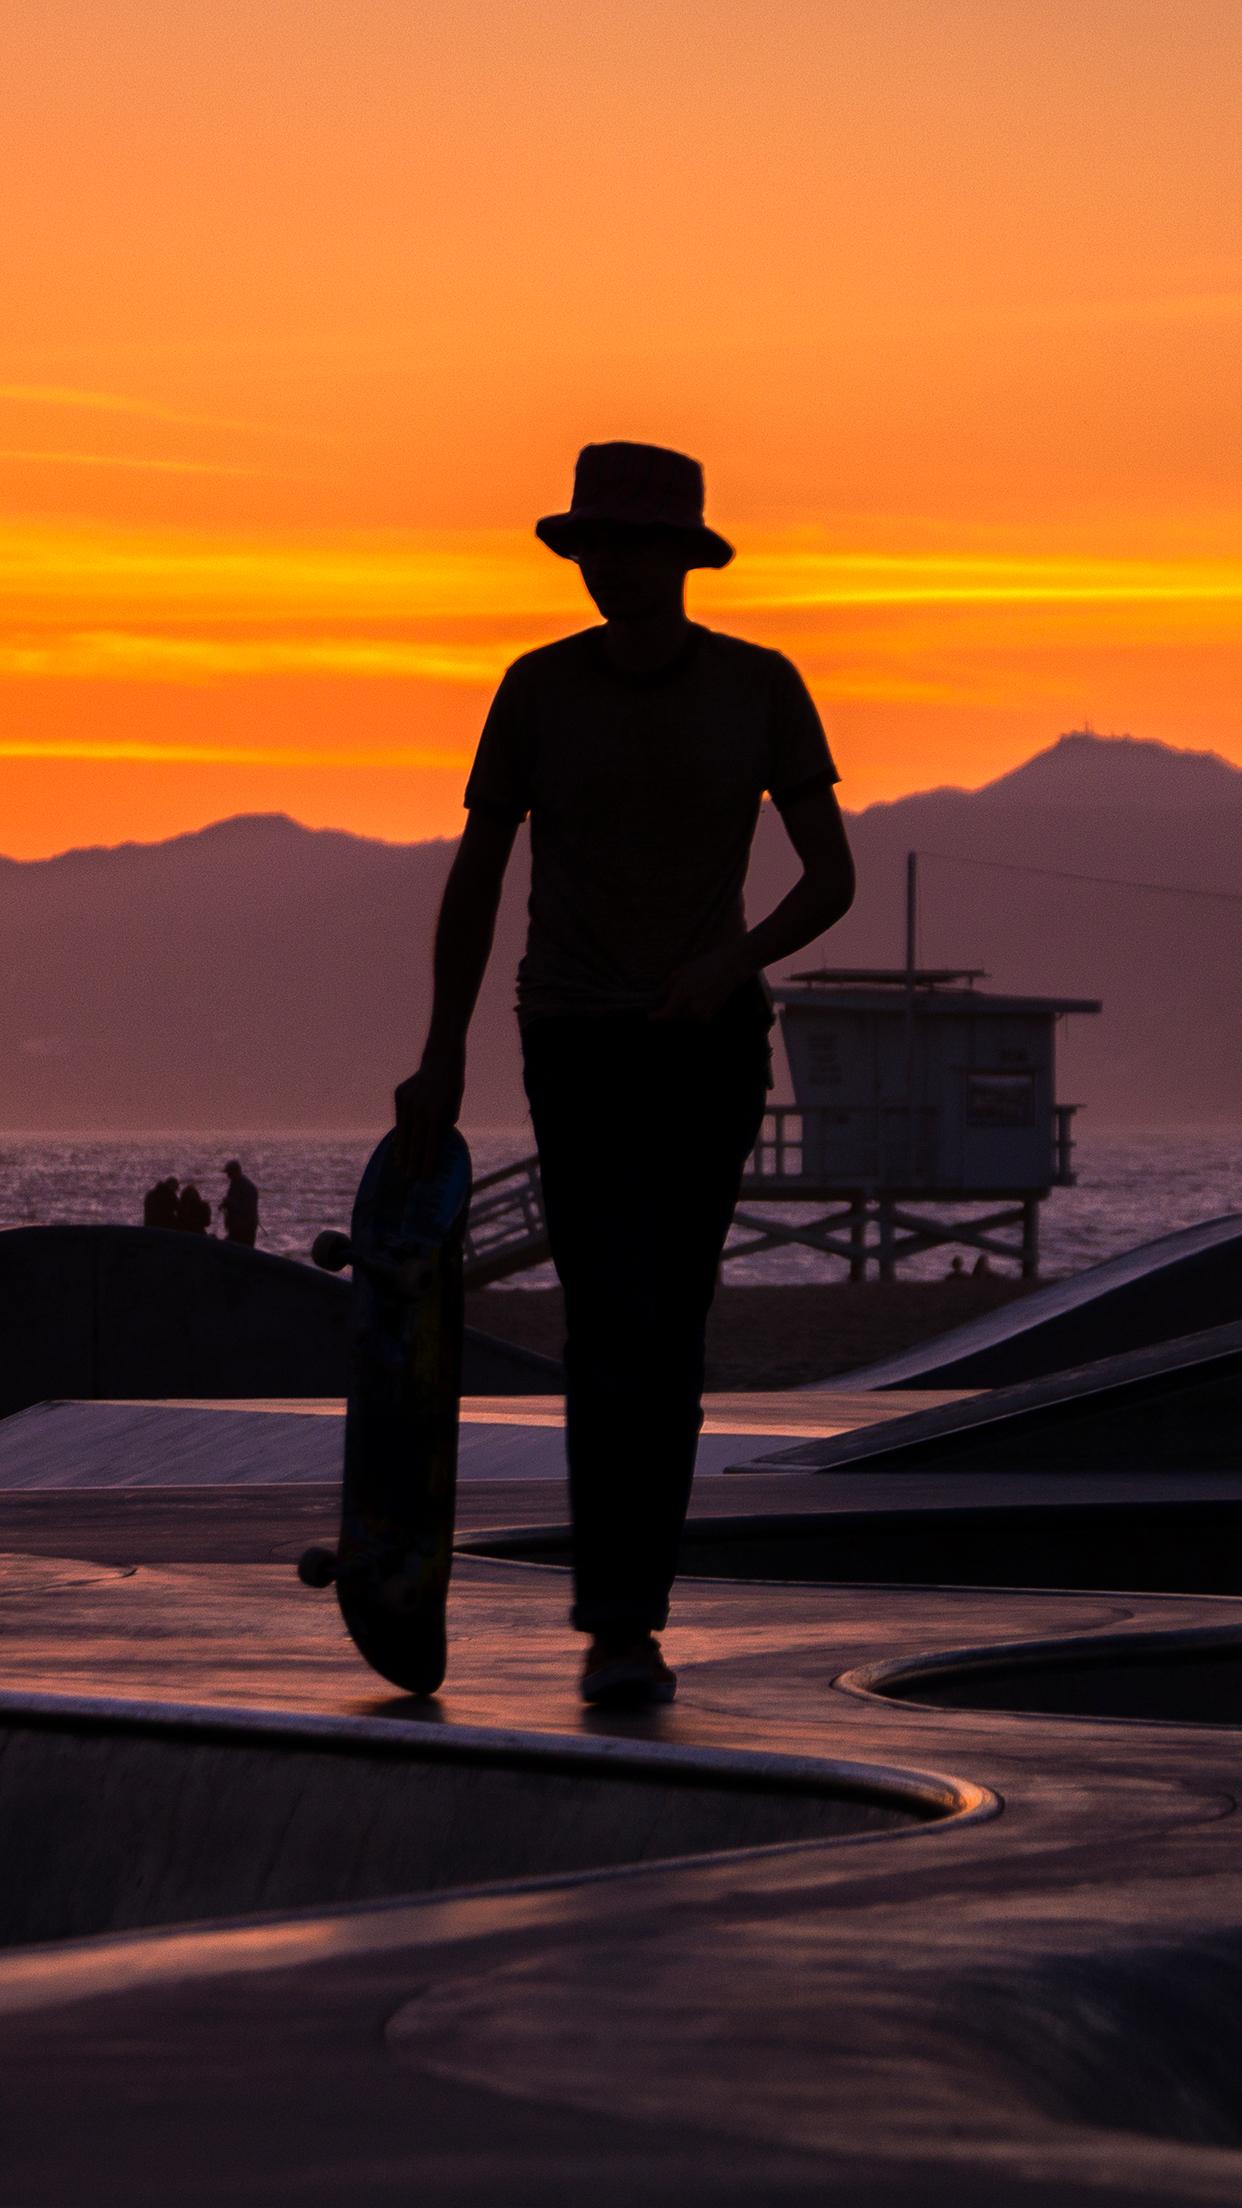 Wasim_Muklashy_Skateboarding_Venice_CA_iPhone6Plus